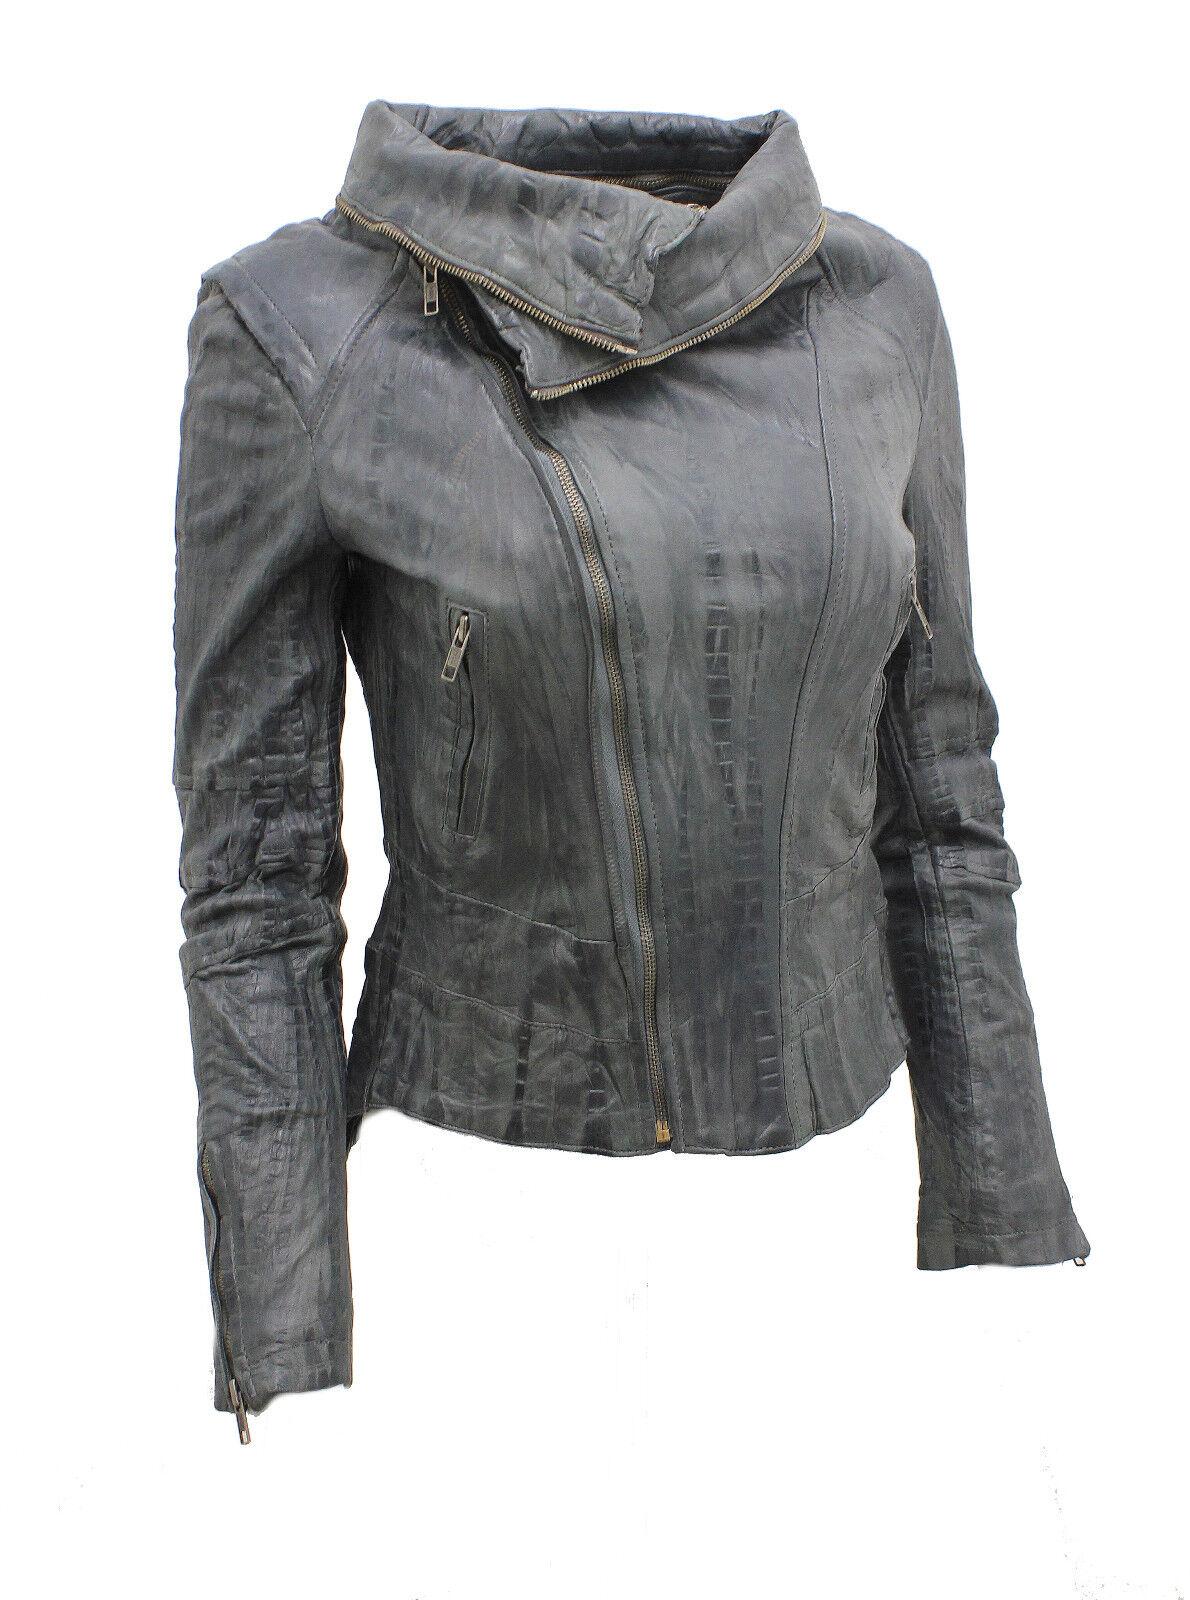 Damen Kurz Retro Grau Abnehmbar Reißverschluss Leder Bikerjacke